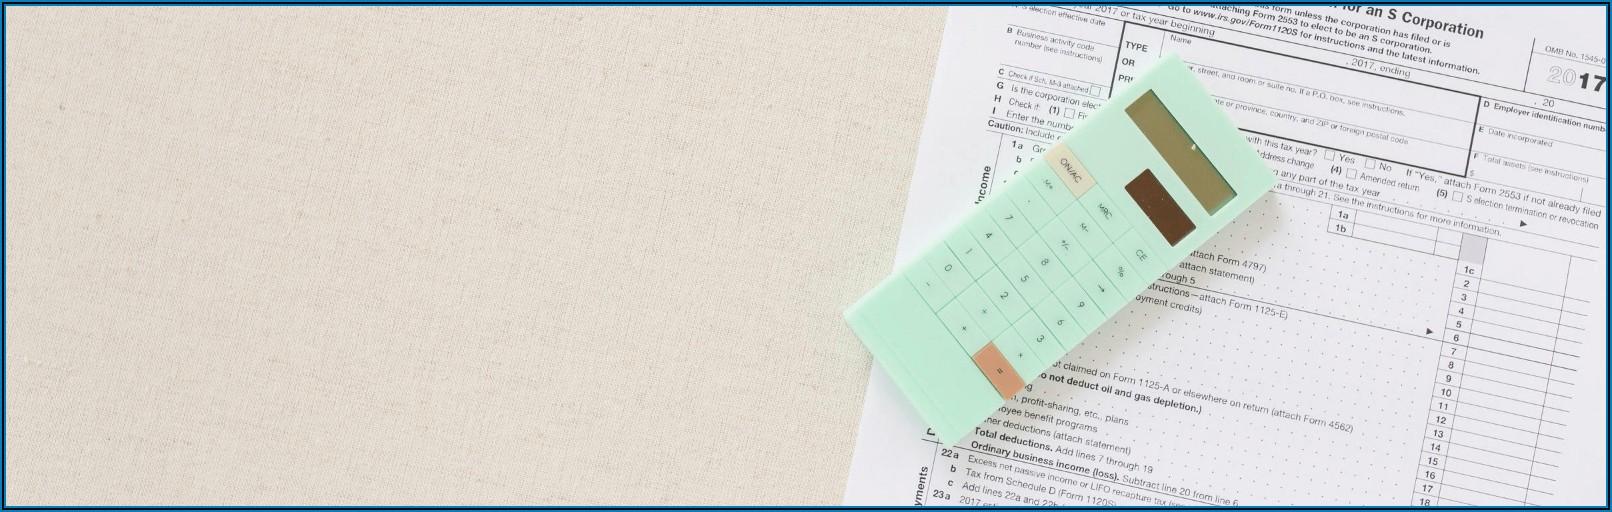 Irs Tax Identification Verification 147c Letter